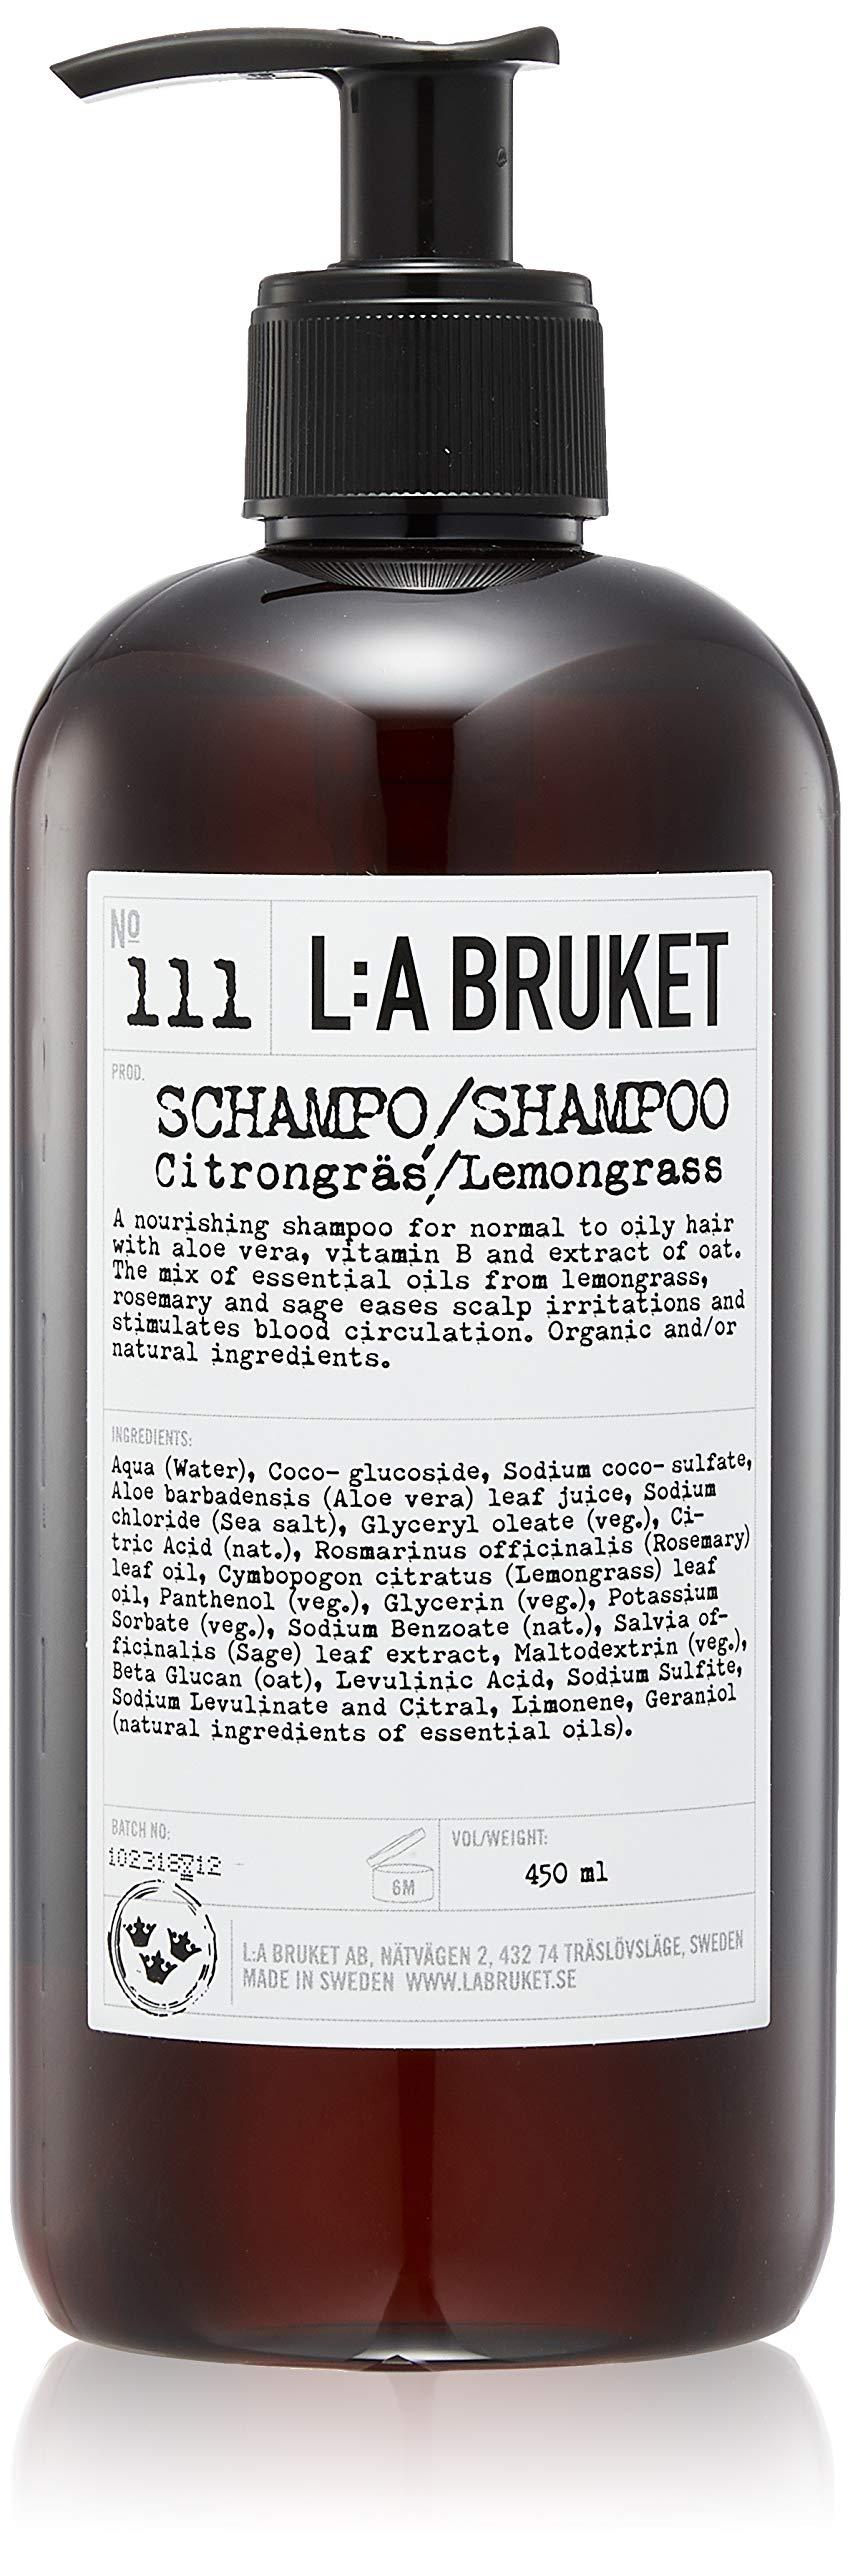 L:A Bruket No. 111 Lemongrass/Citrongras Shampoo 450 ml by L:A Bruket